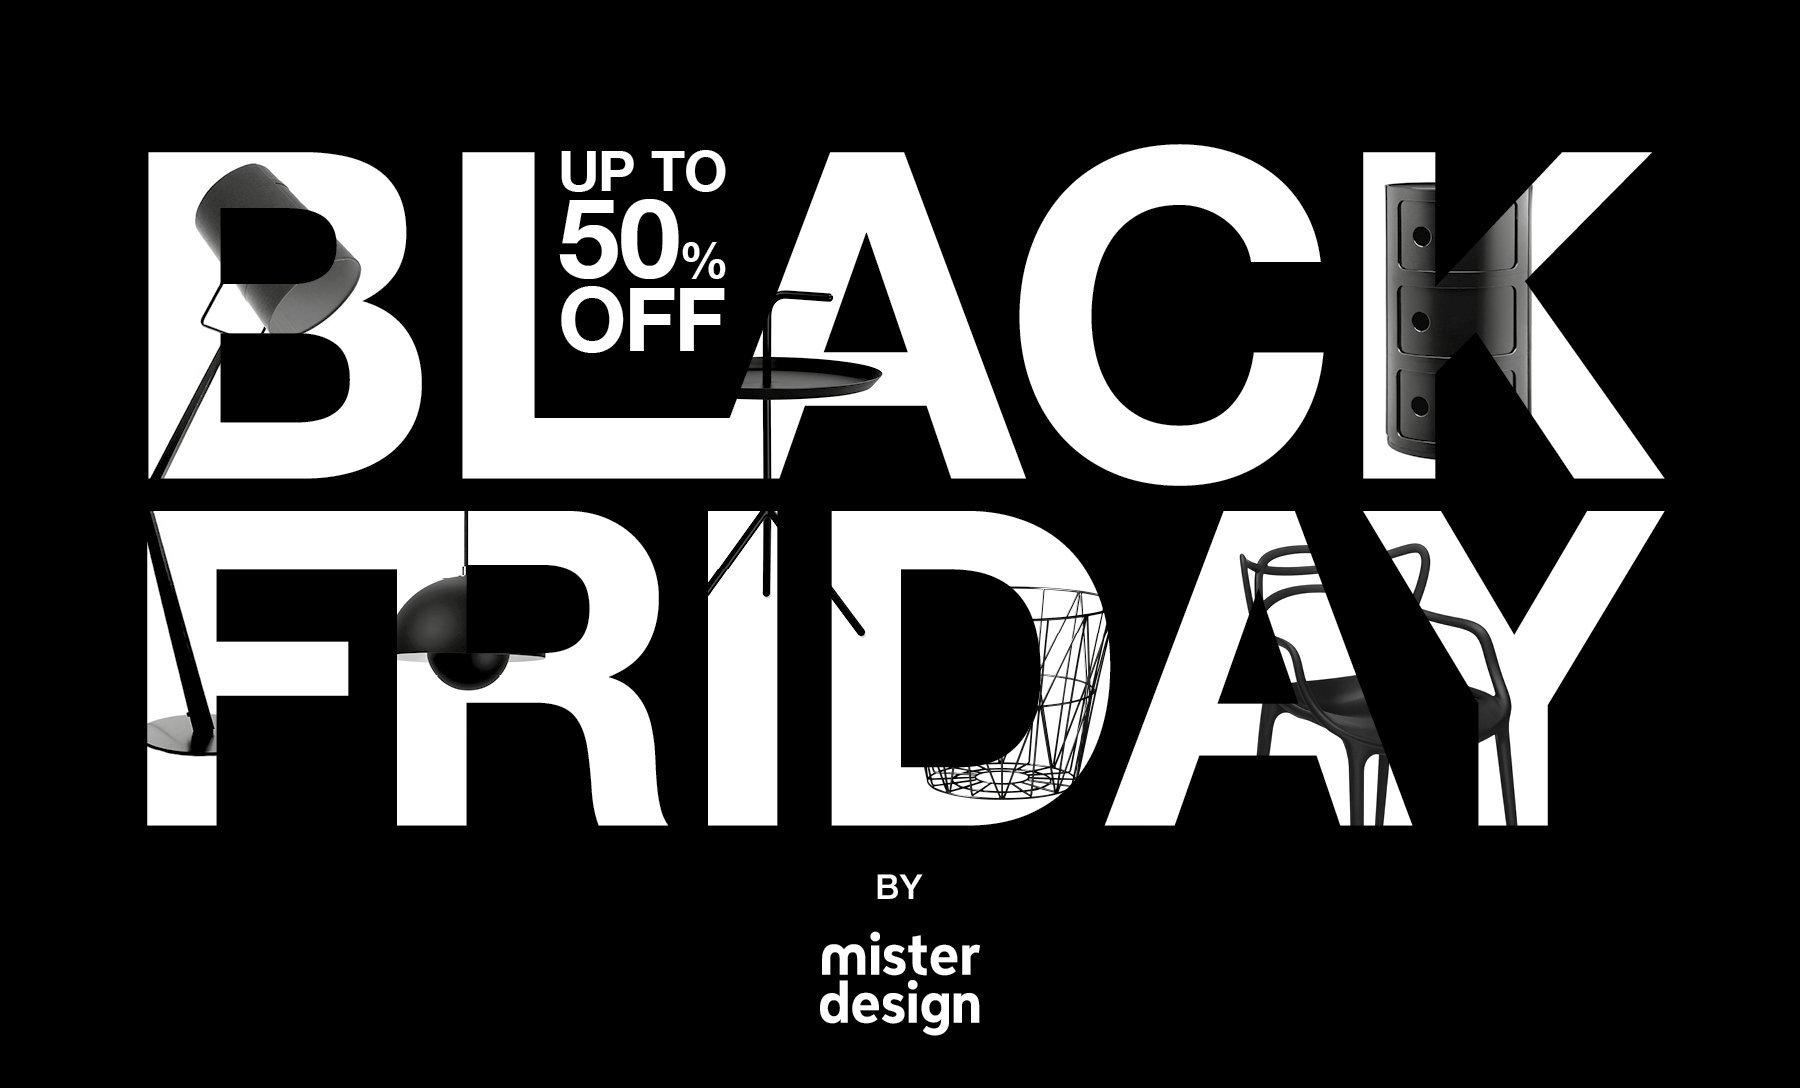 MisterDesign Black Friday Campagne